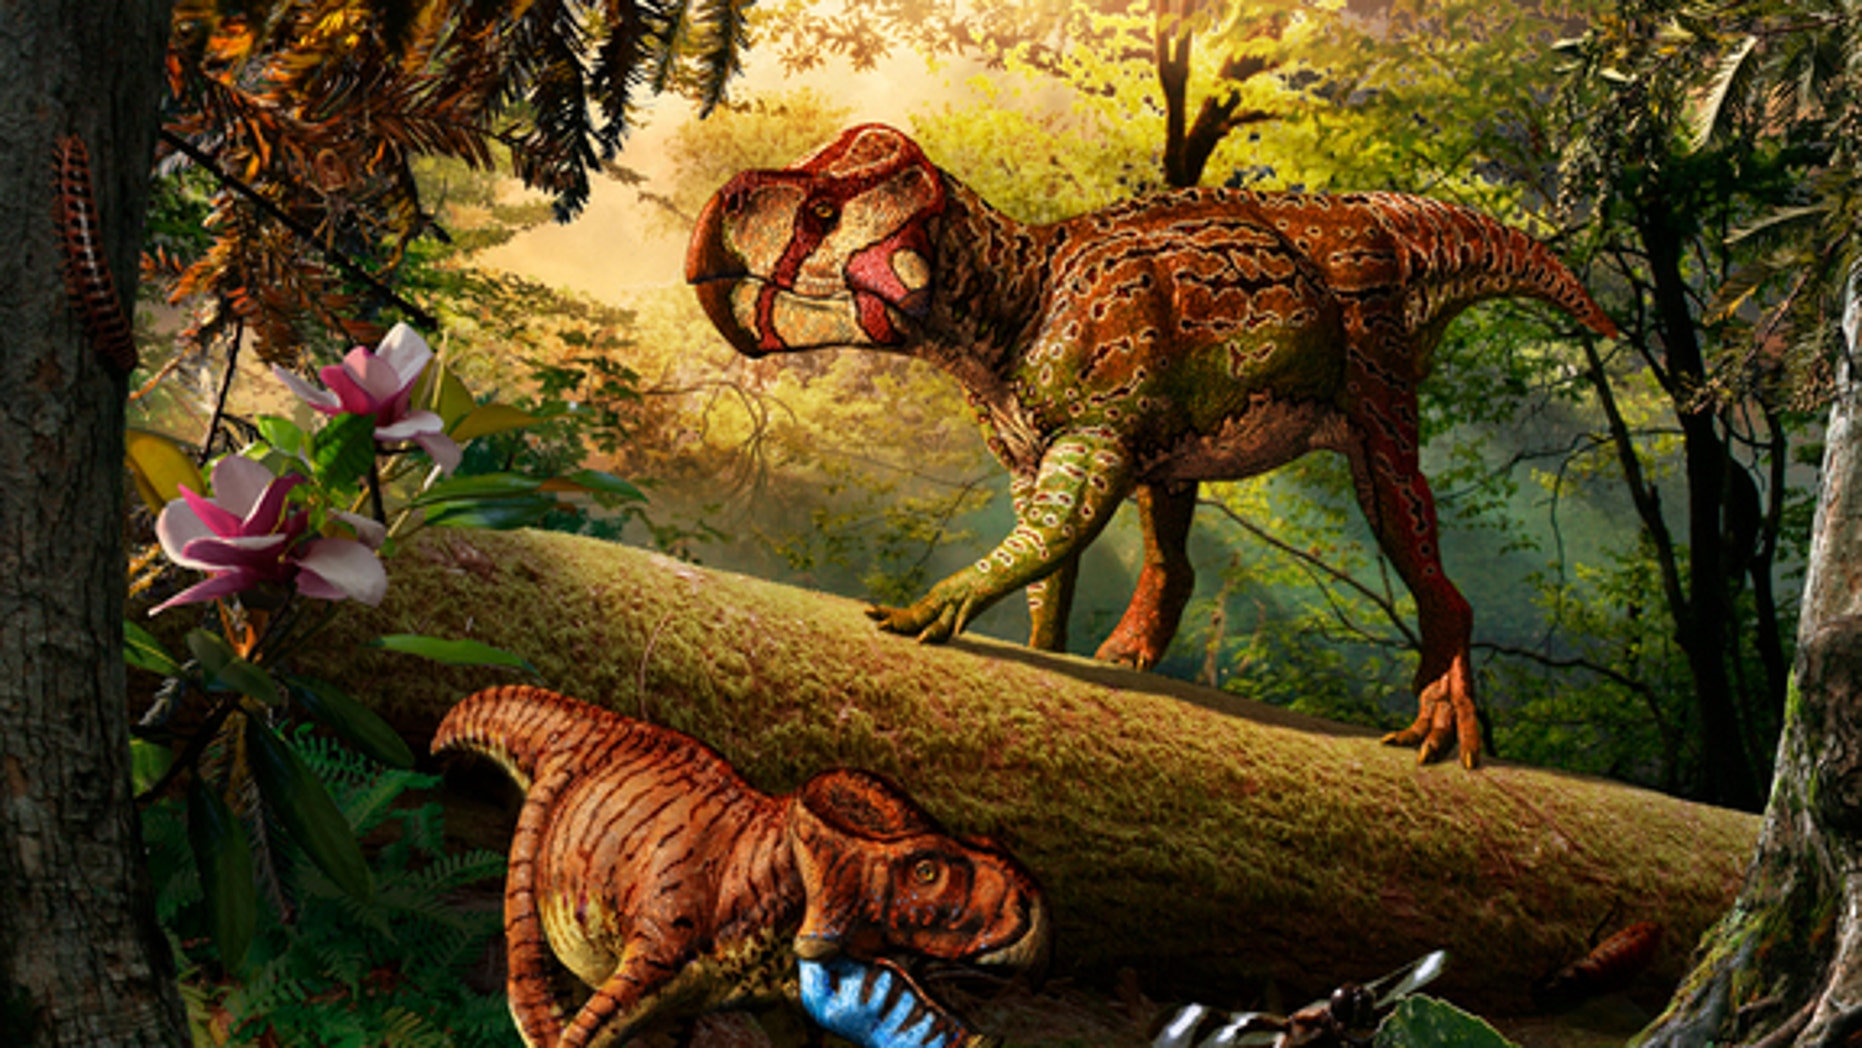 Unescoceratops koppelhusae (upper right) and Gryphoceratops morrisonii (lower left), new leptoceratopsid dinosaurs from Alberta, Canada.